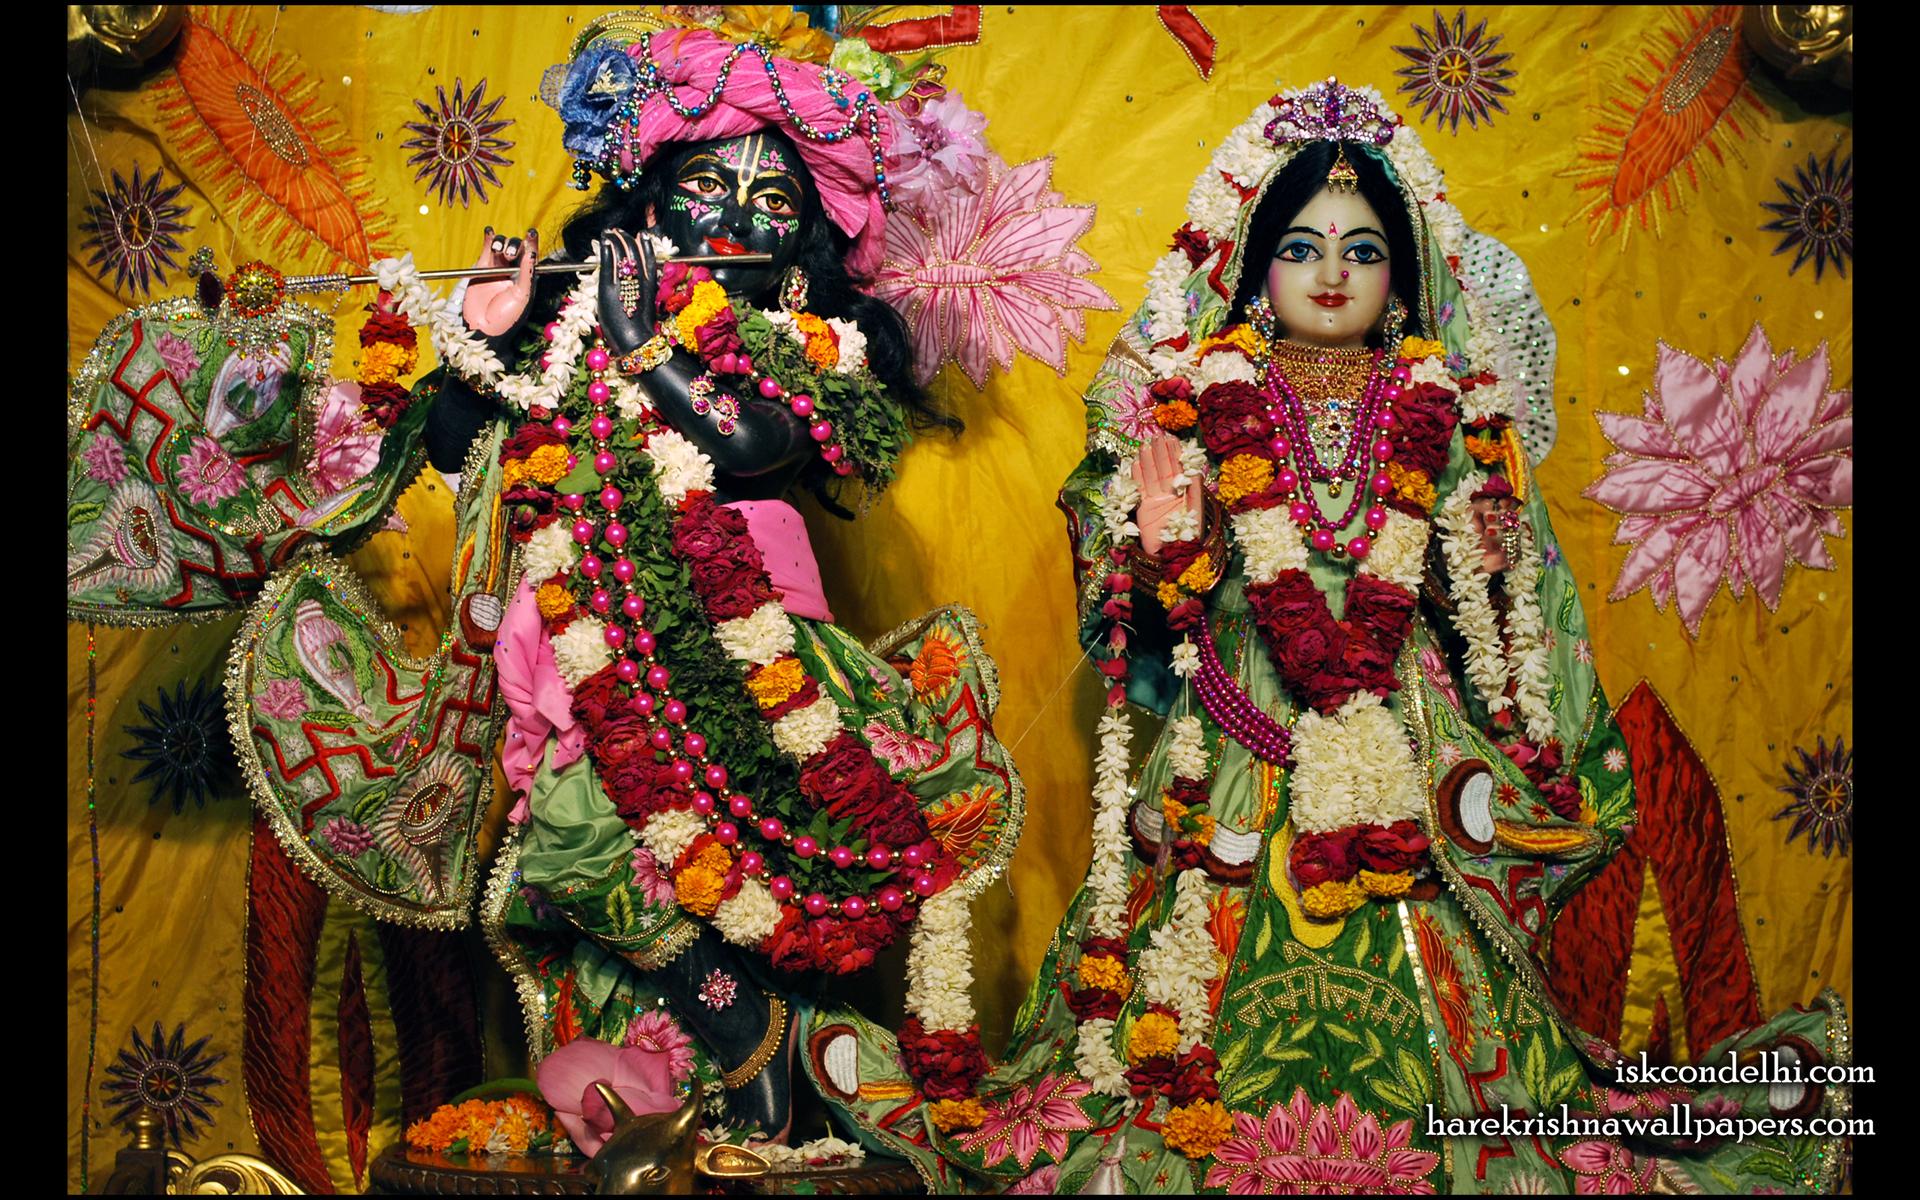 Sri Sri Radha Parthasarathi Wallpaper (003) Size 1920x1200 Download